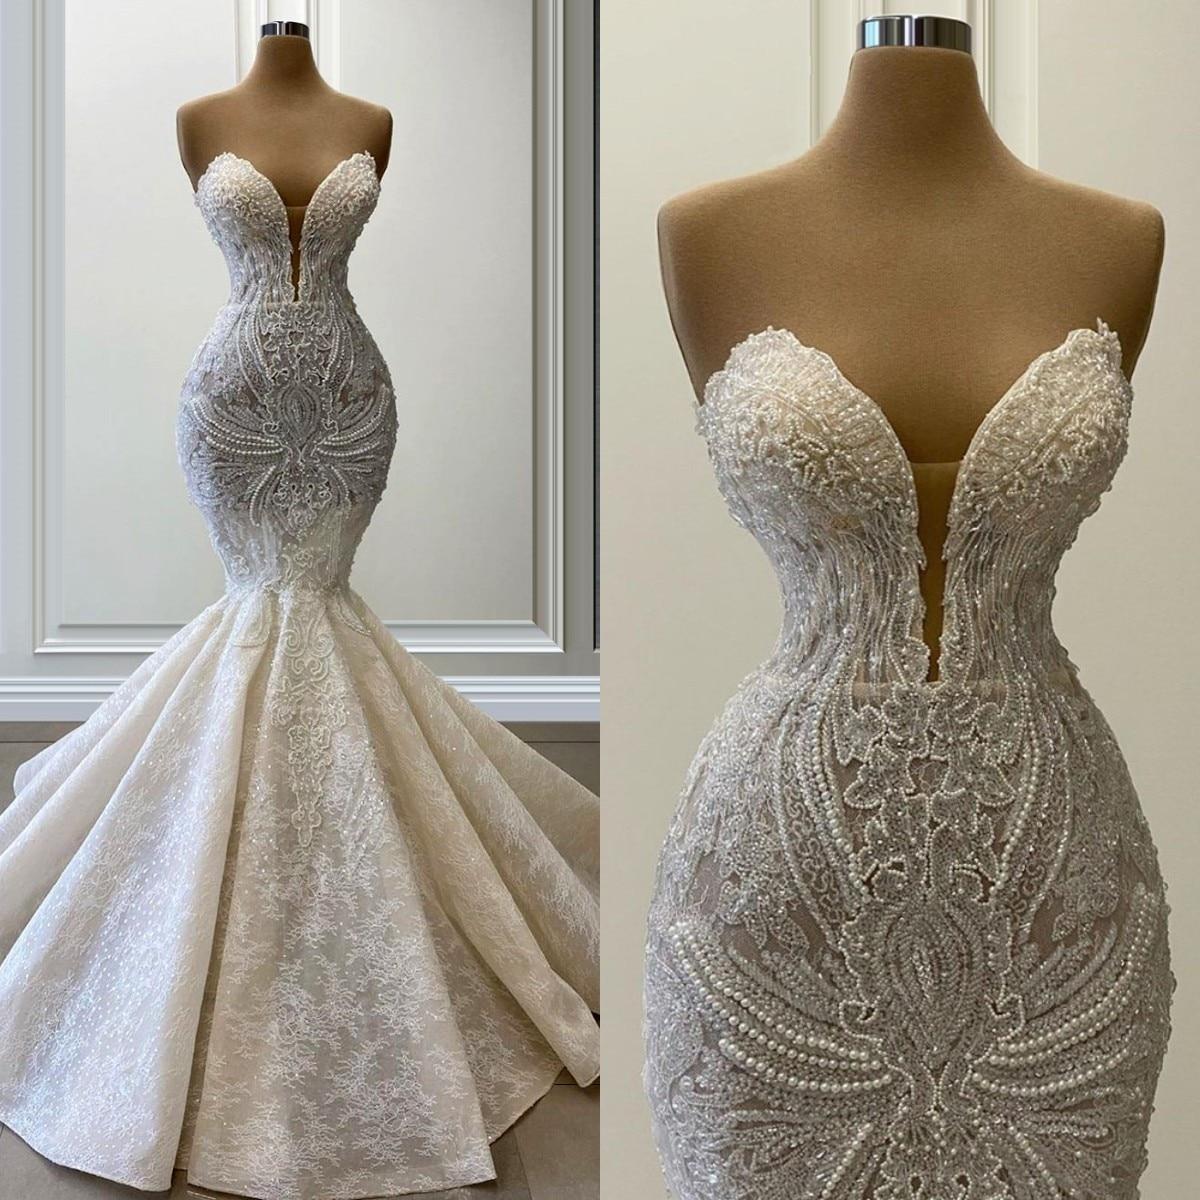 Promo 2022 Lace Pearls Mermaid Wedding Dresses Bridal Gowns Sweetheart Appliques Country Vestidos De Novia